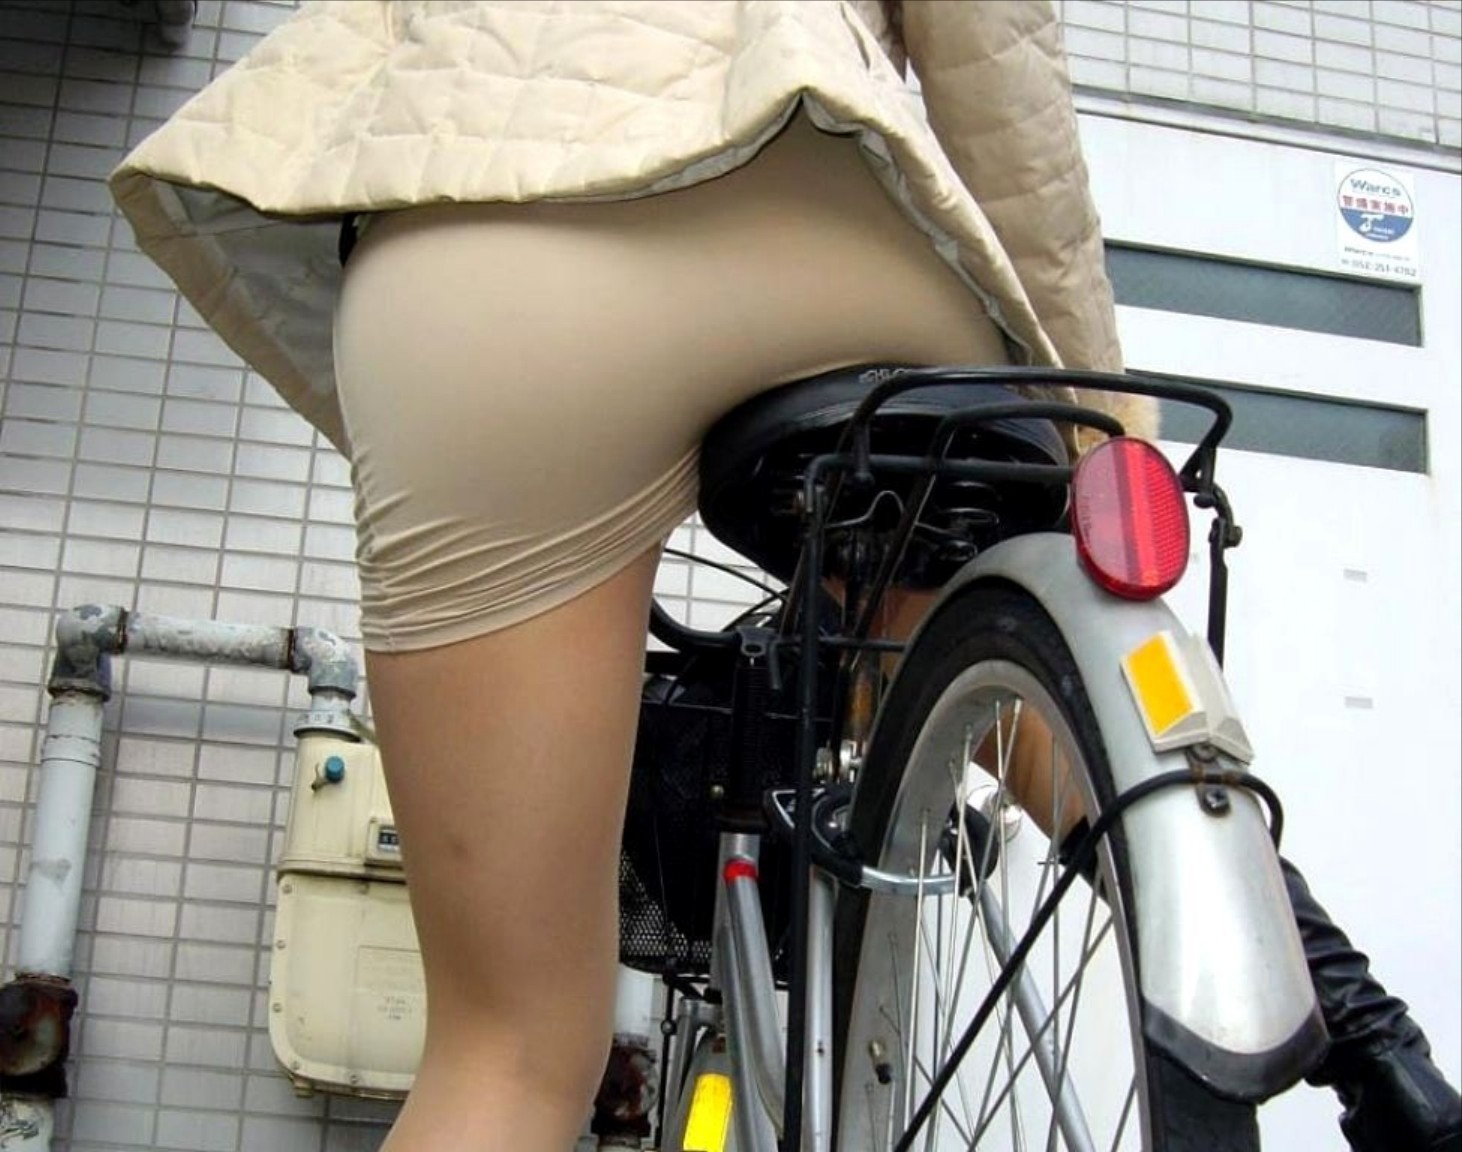 OL_美脚_自転車_盗撮_エロ画像_08